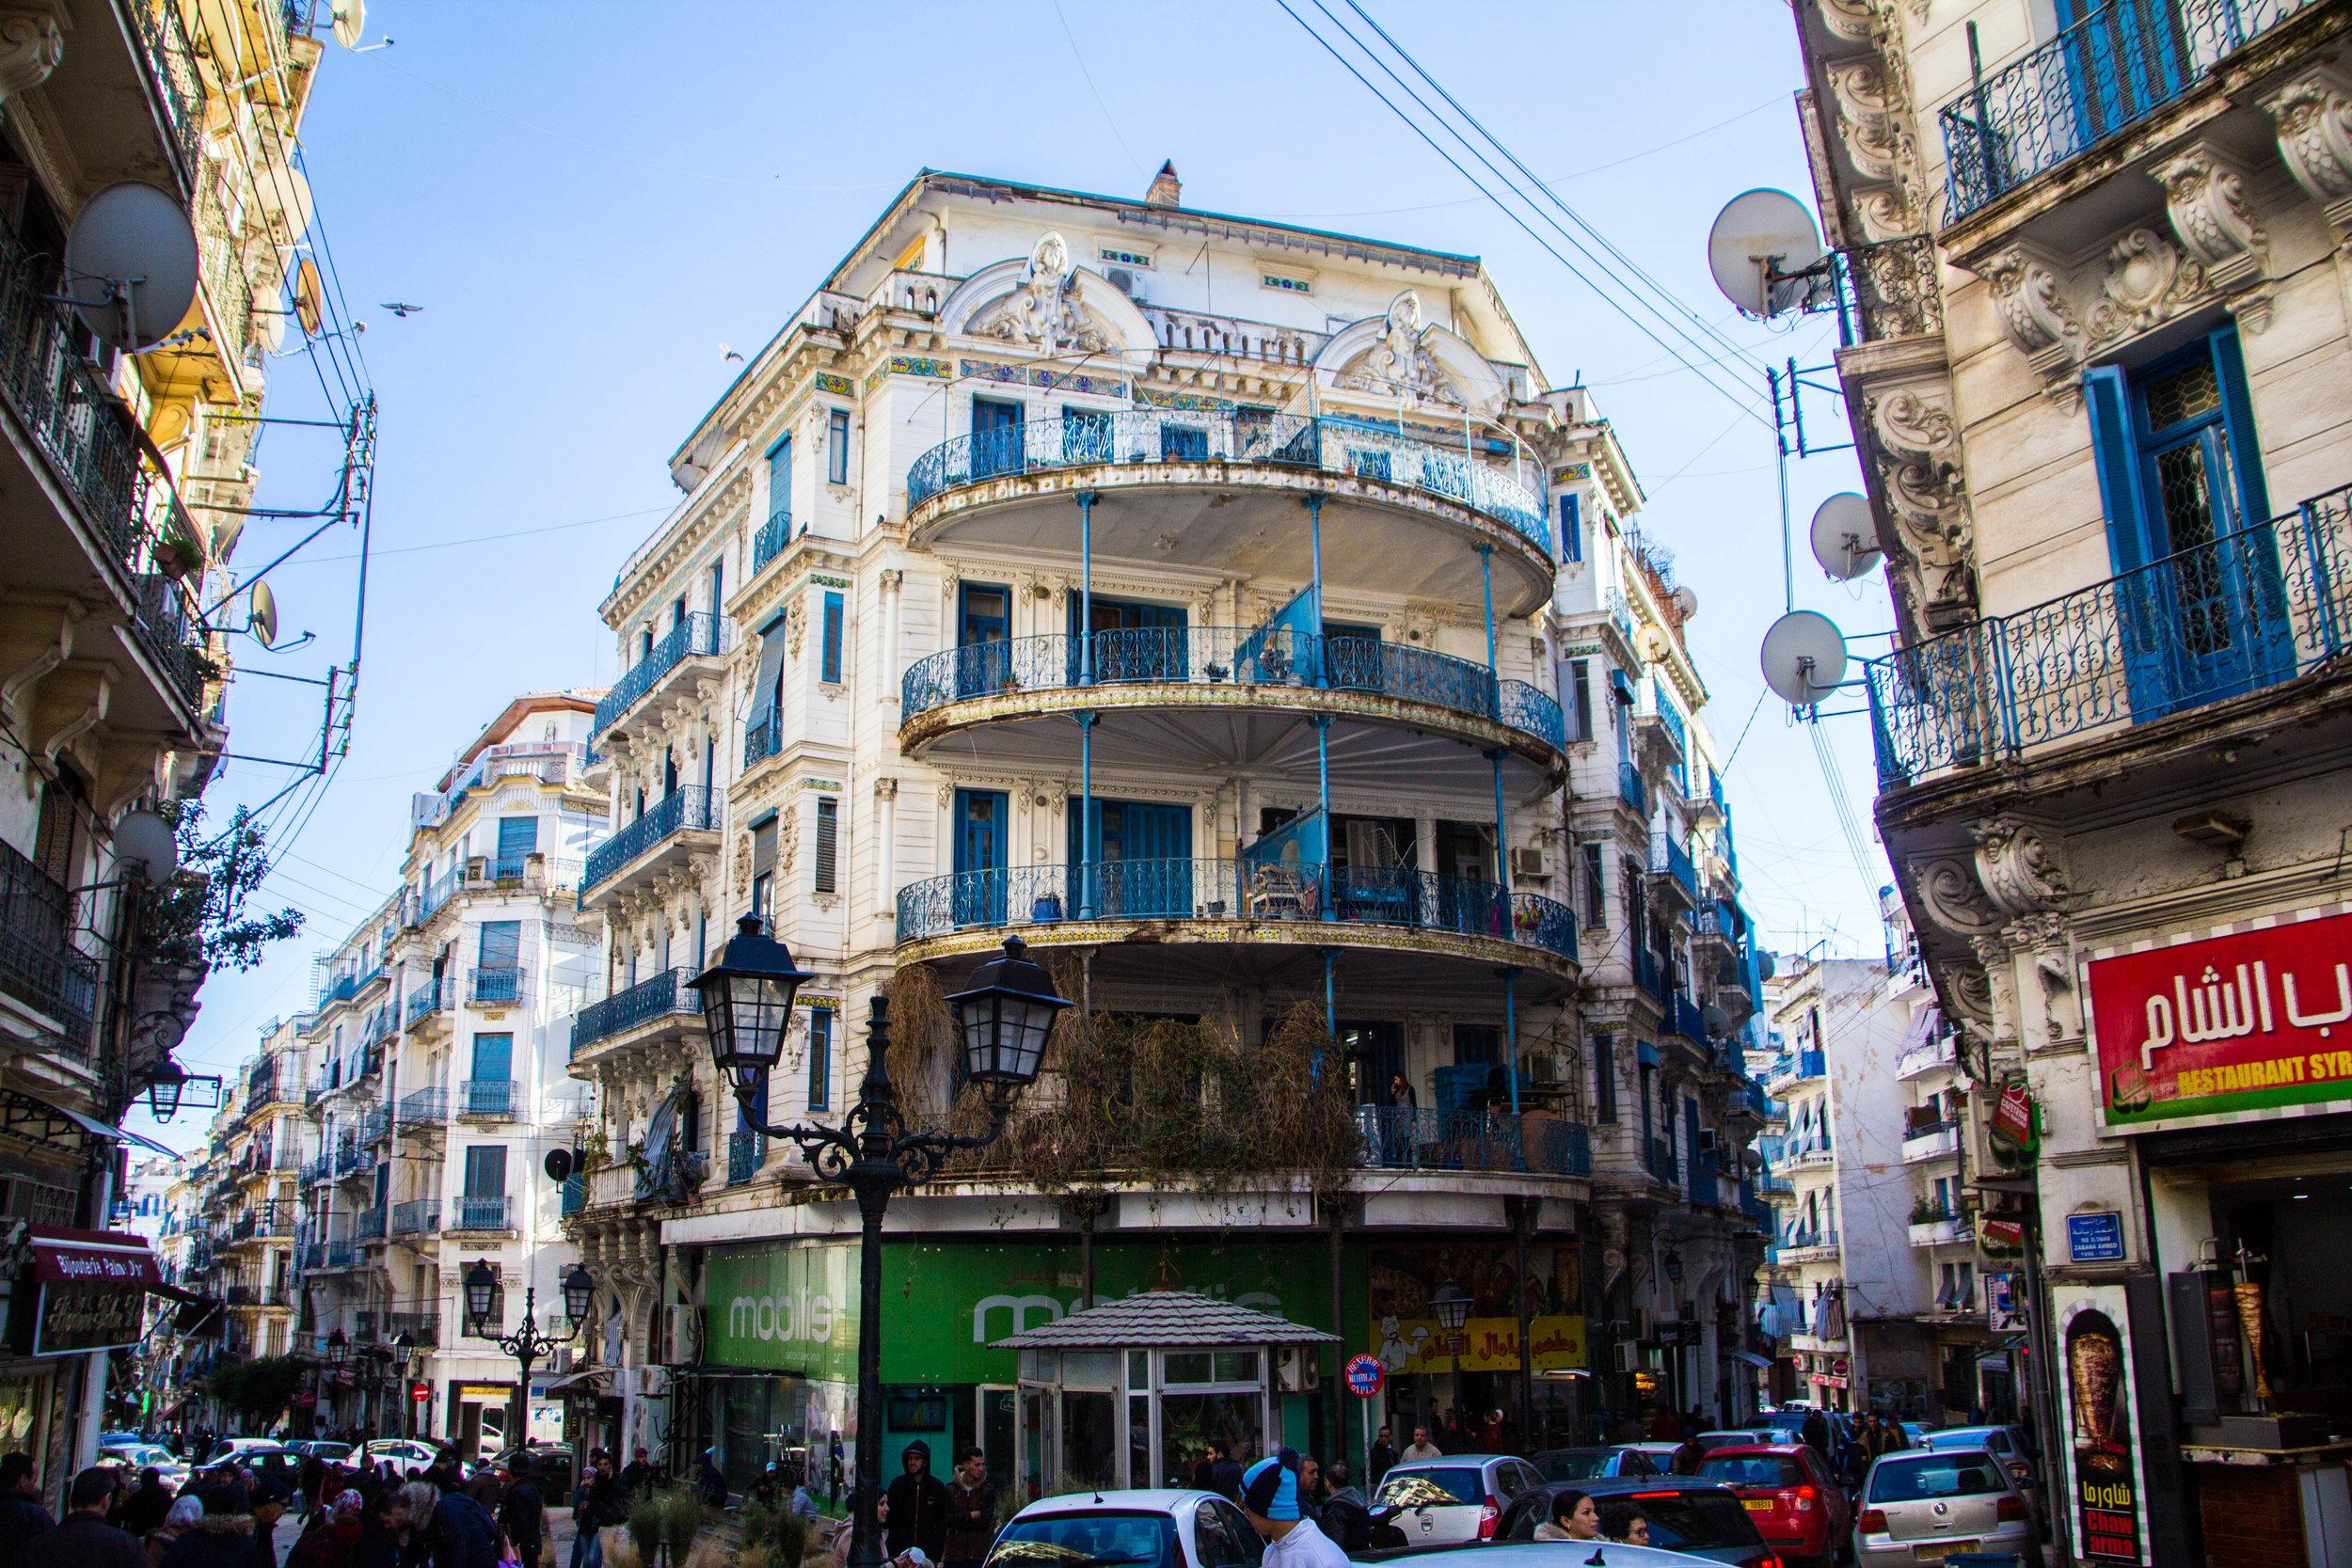 streets-algiers-algeria-31.jpg